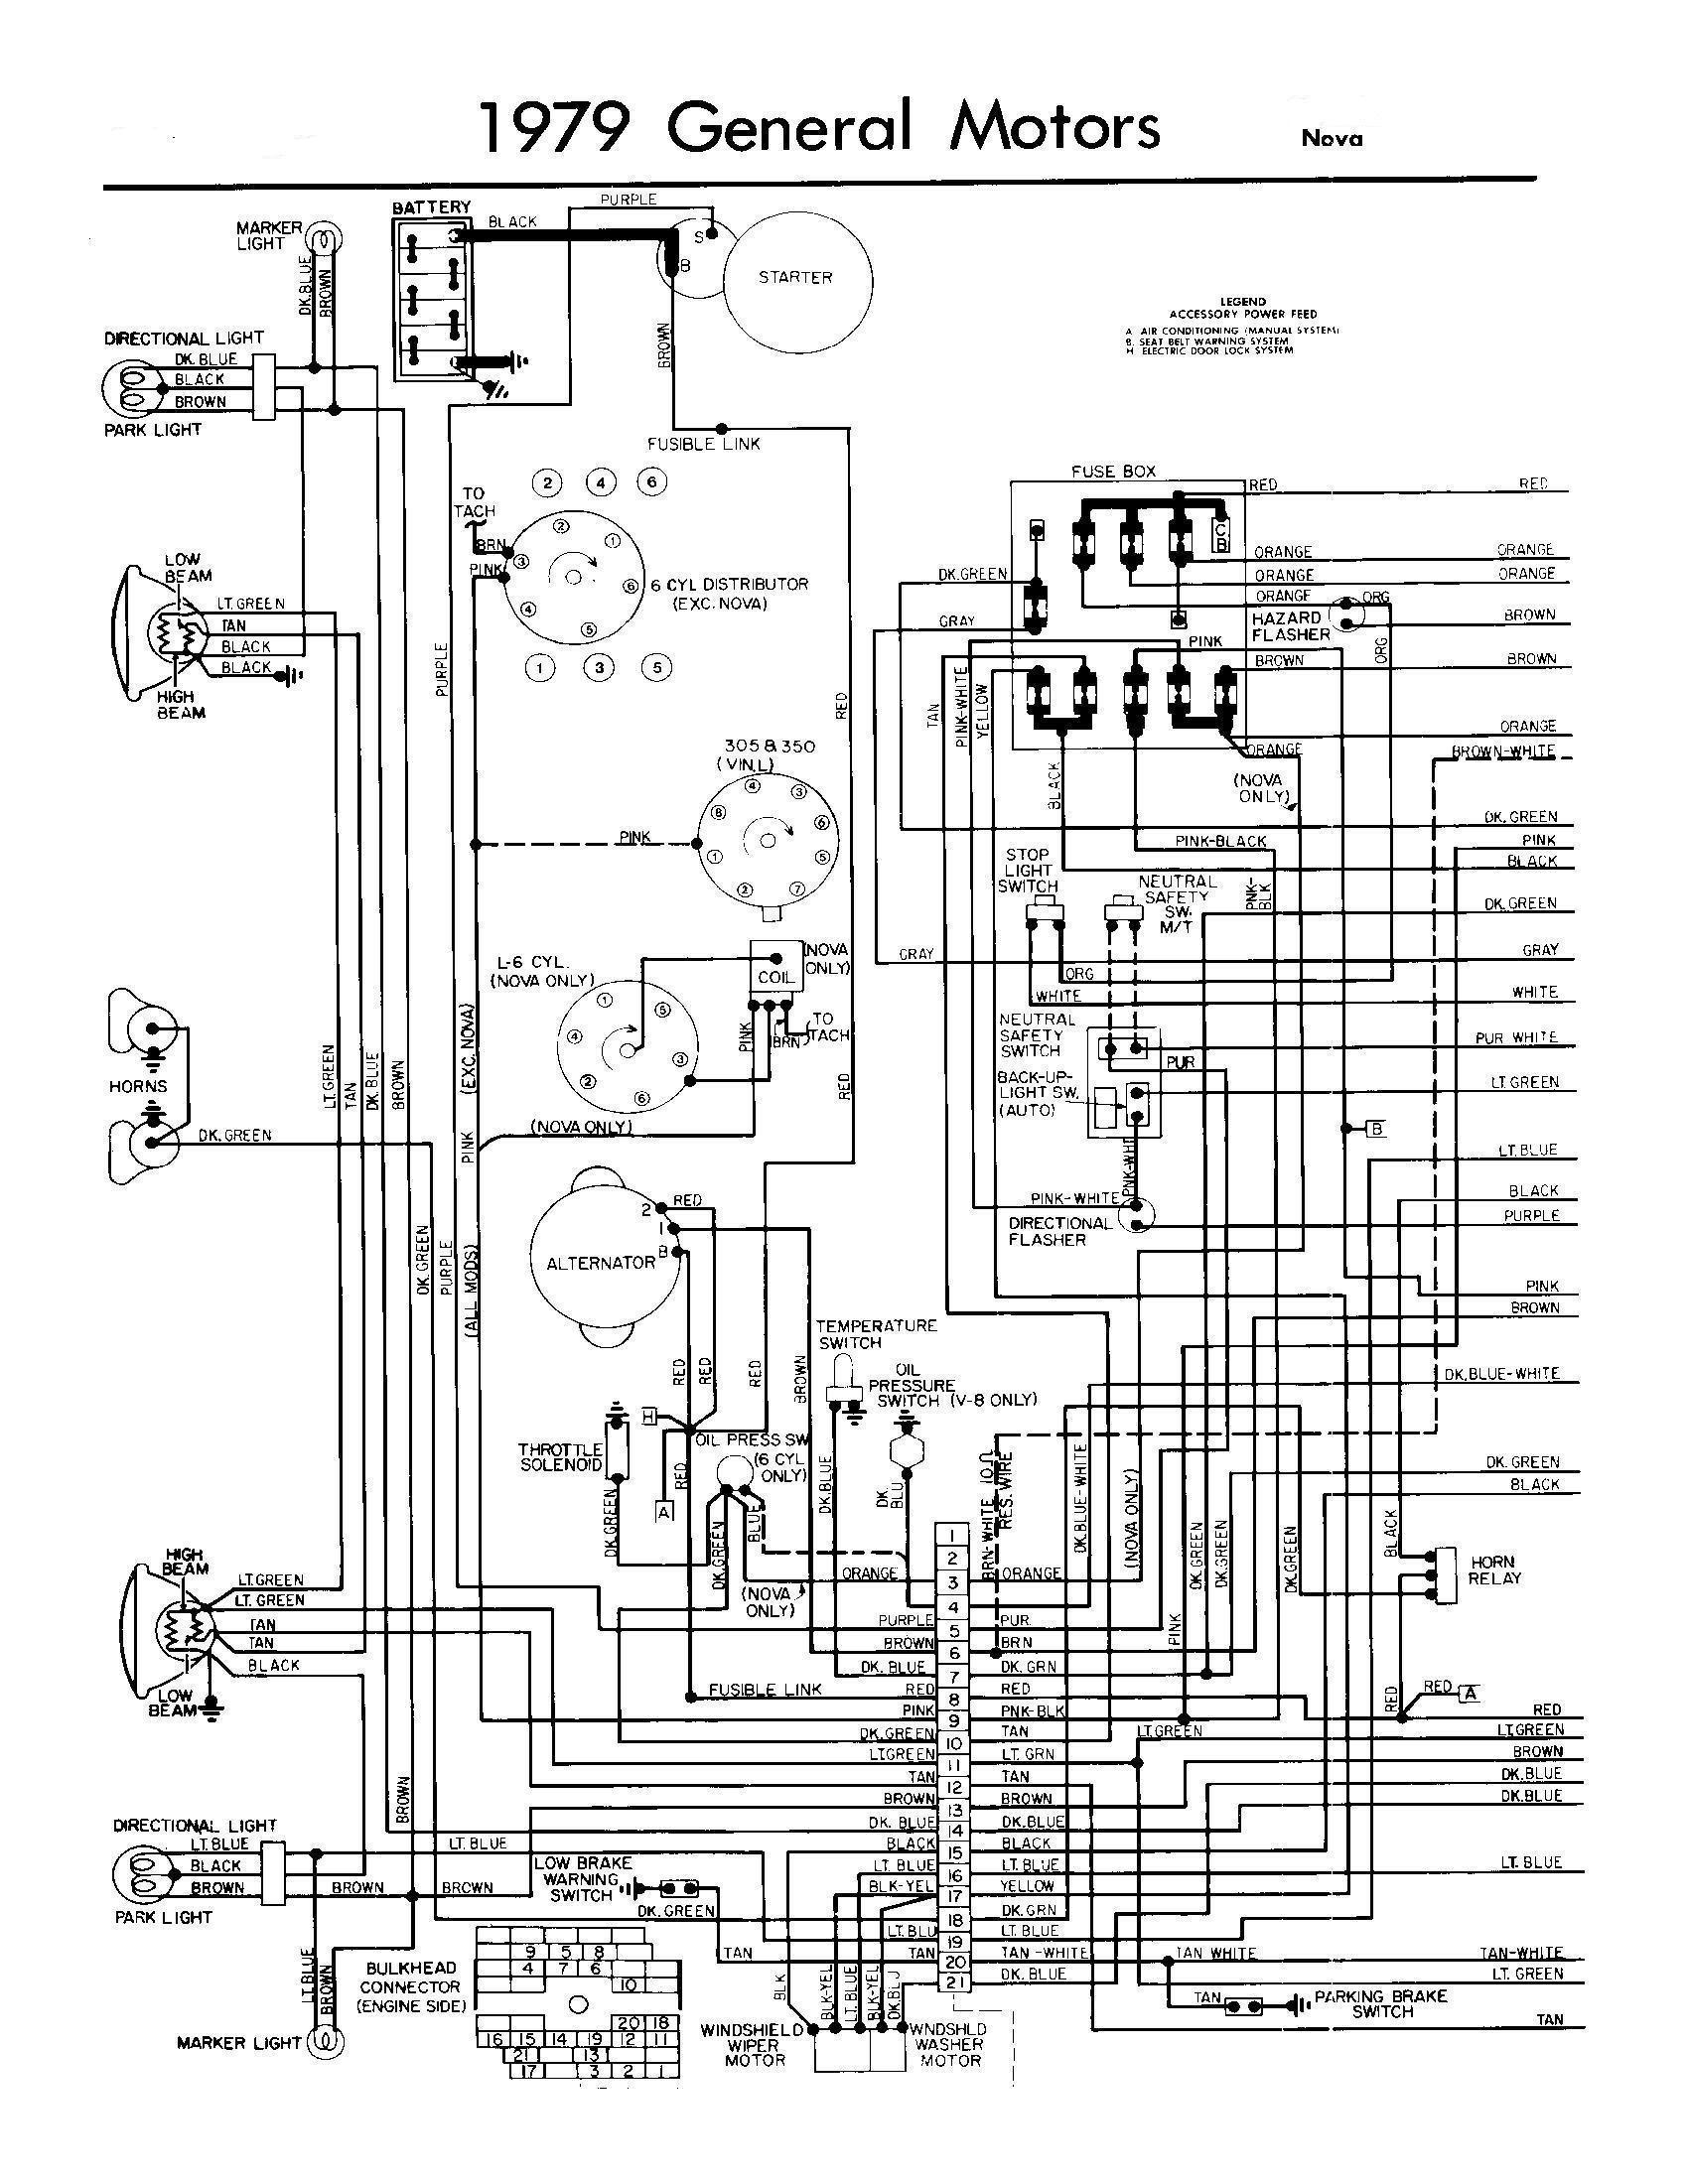 1988 Suzuki Samurai Alternator Wiring Sears Wiring Diagrams Of 1988 Suzuki Samurai Alternator Wiring